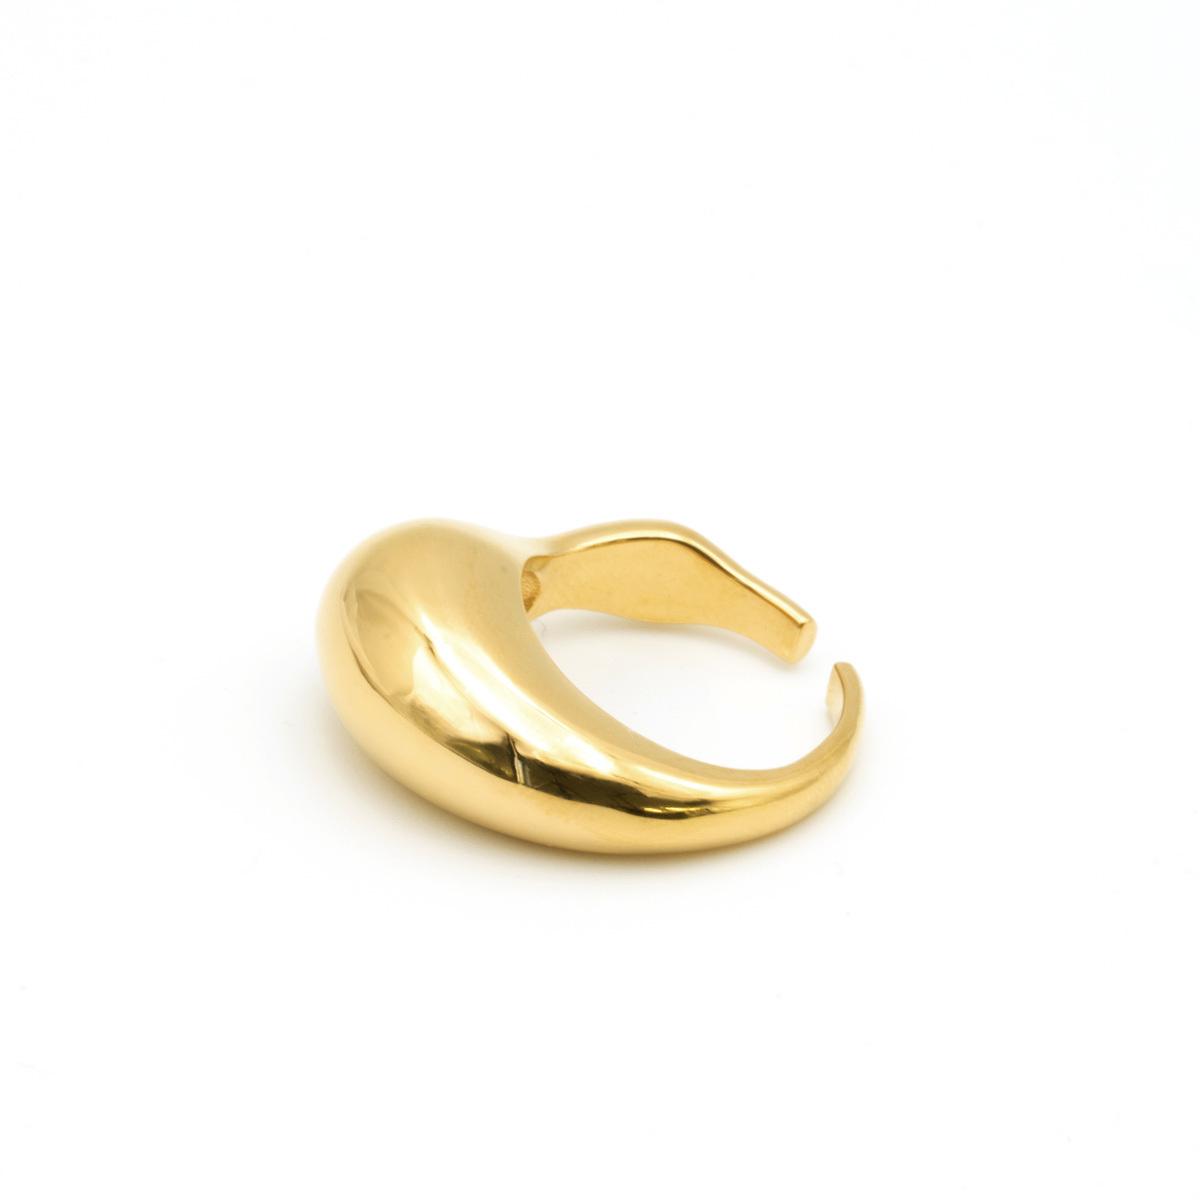 Plump Ear cuff / Ring